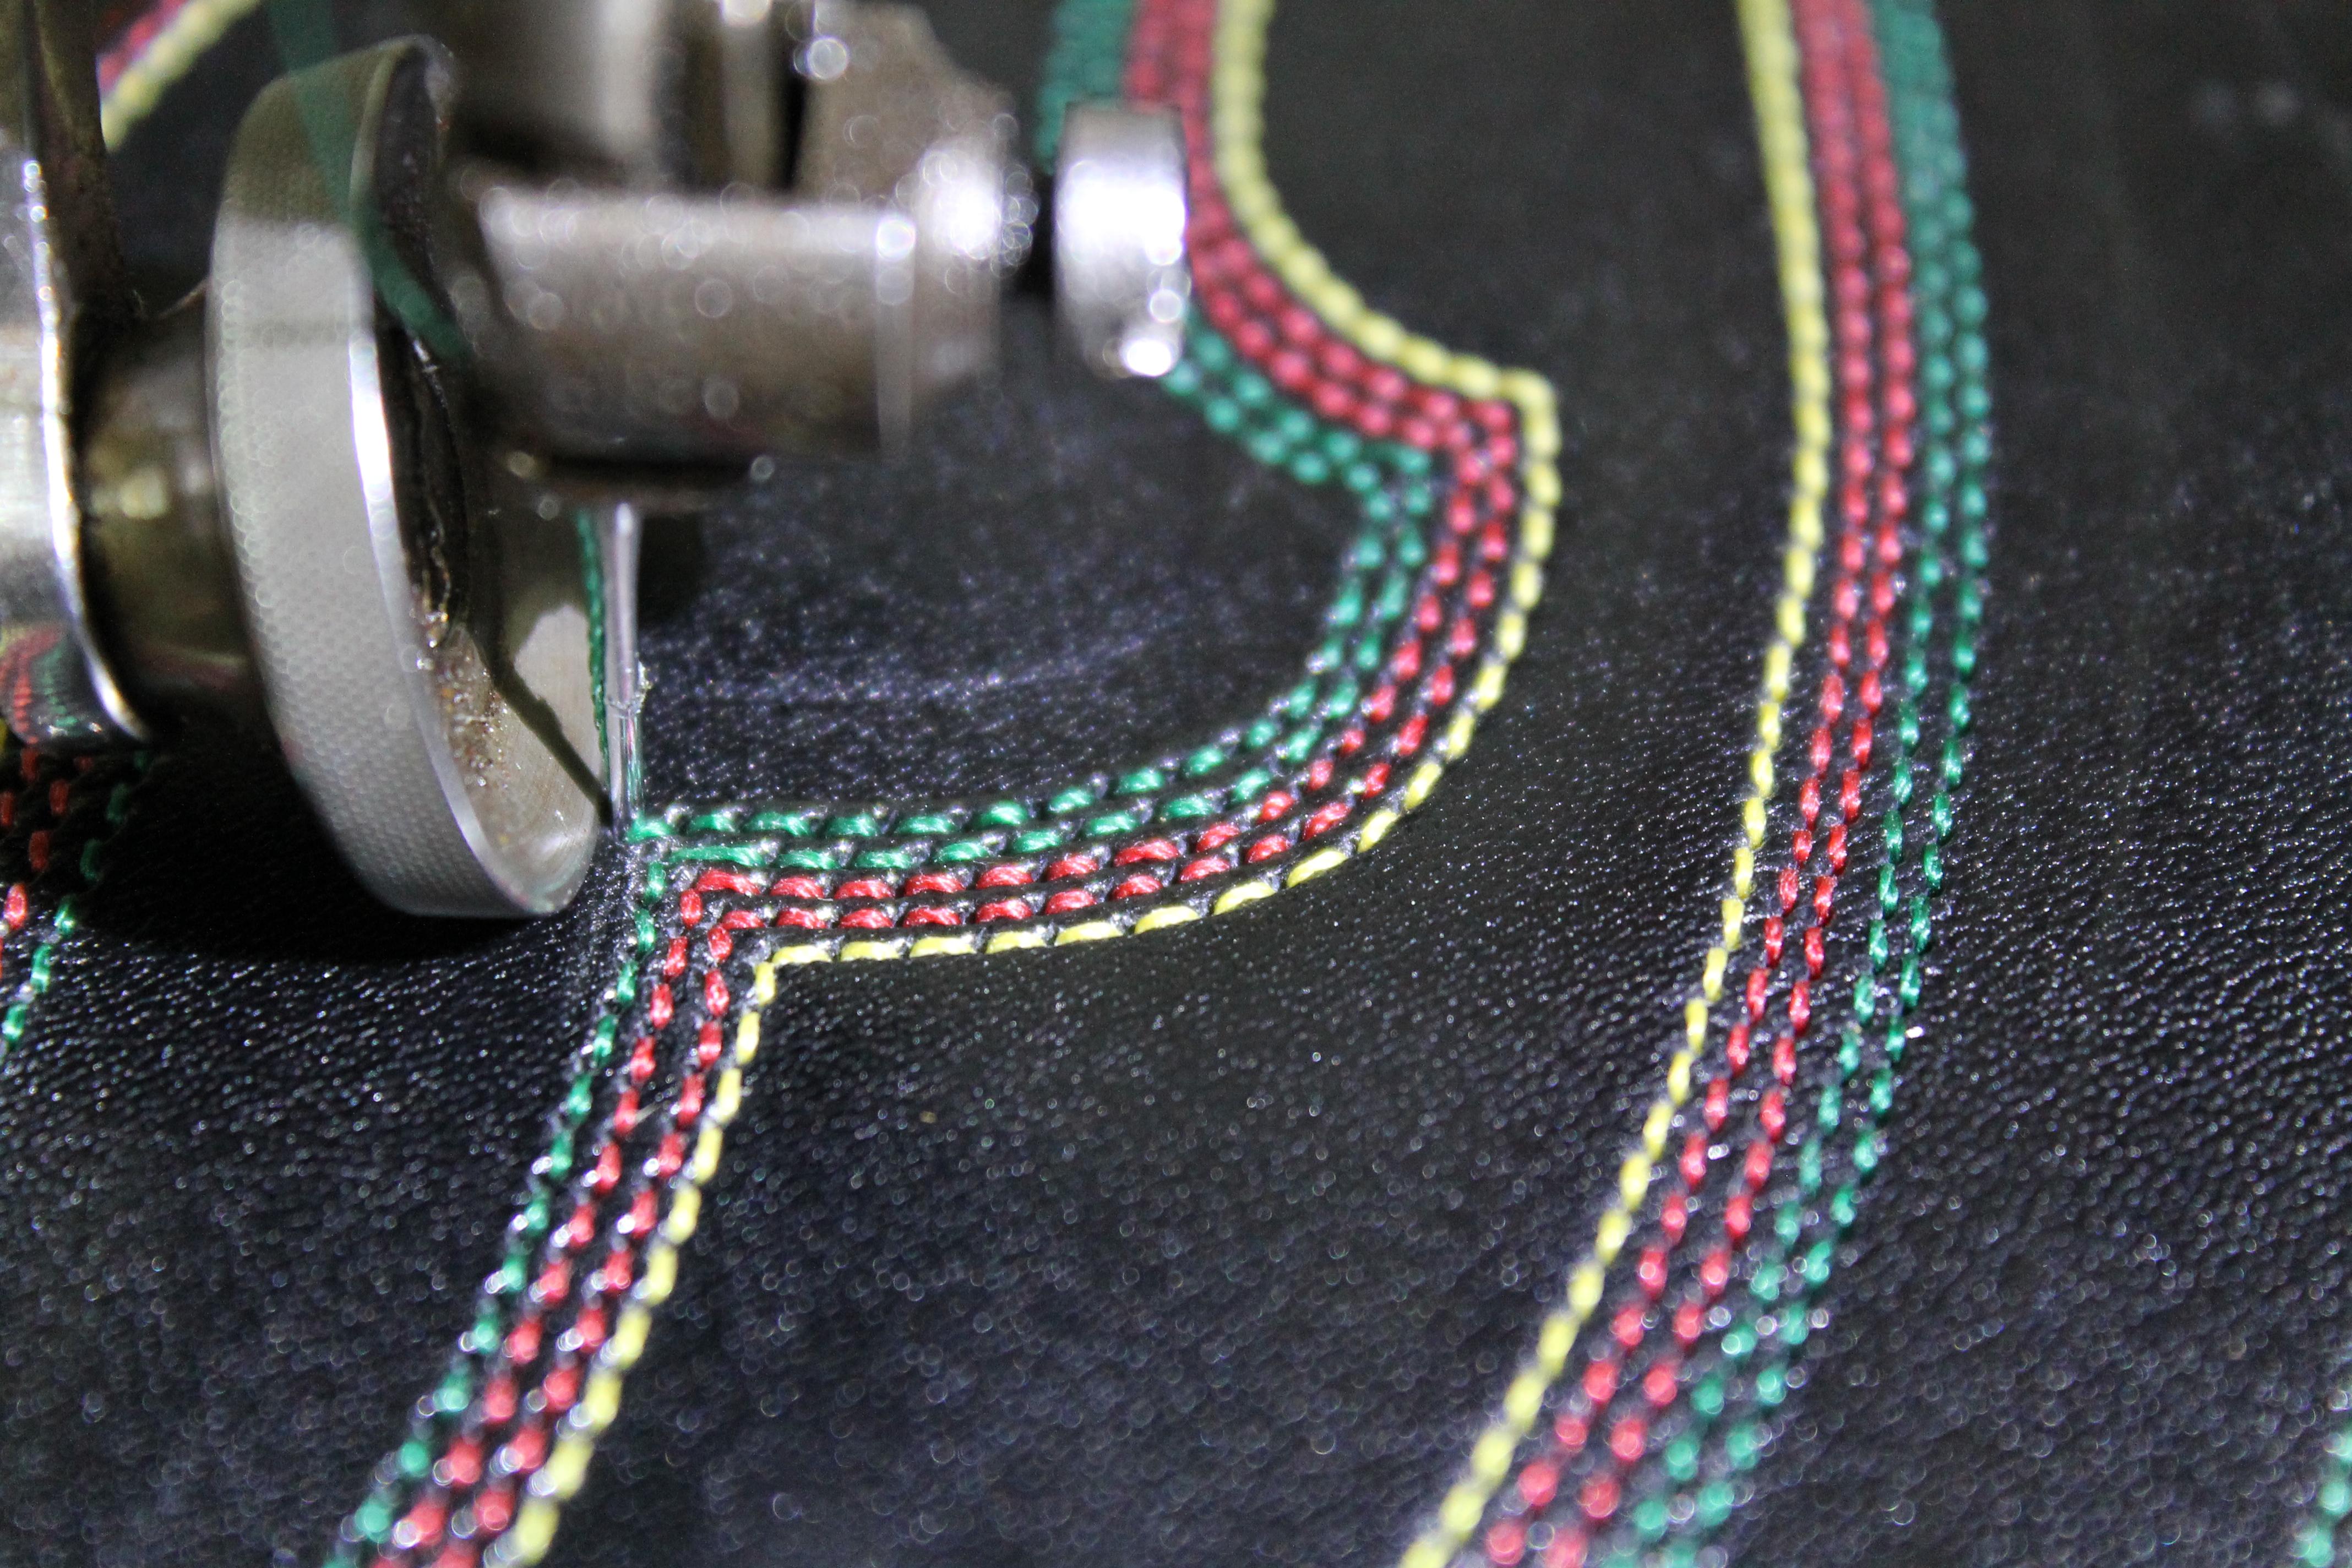 Stitching tops